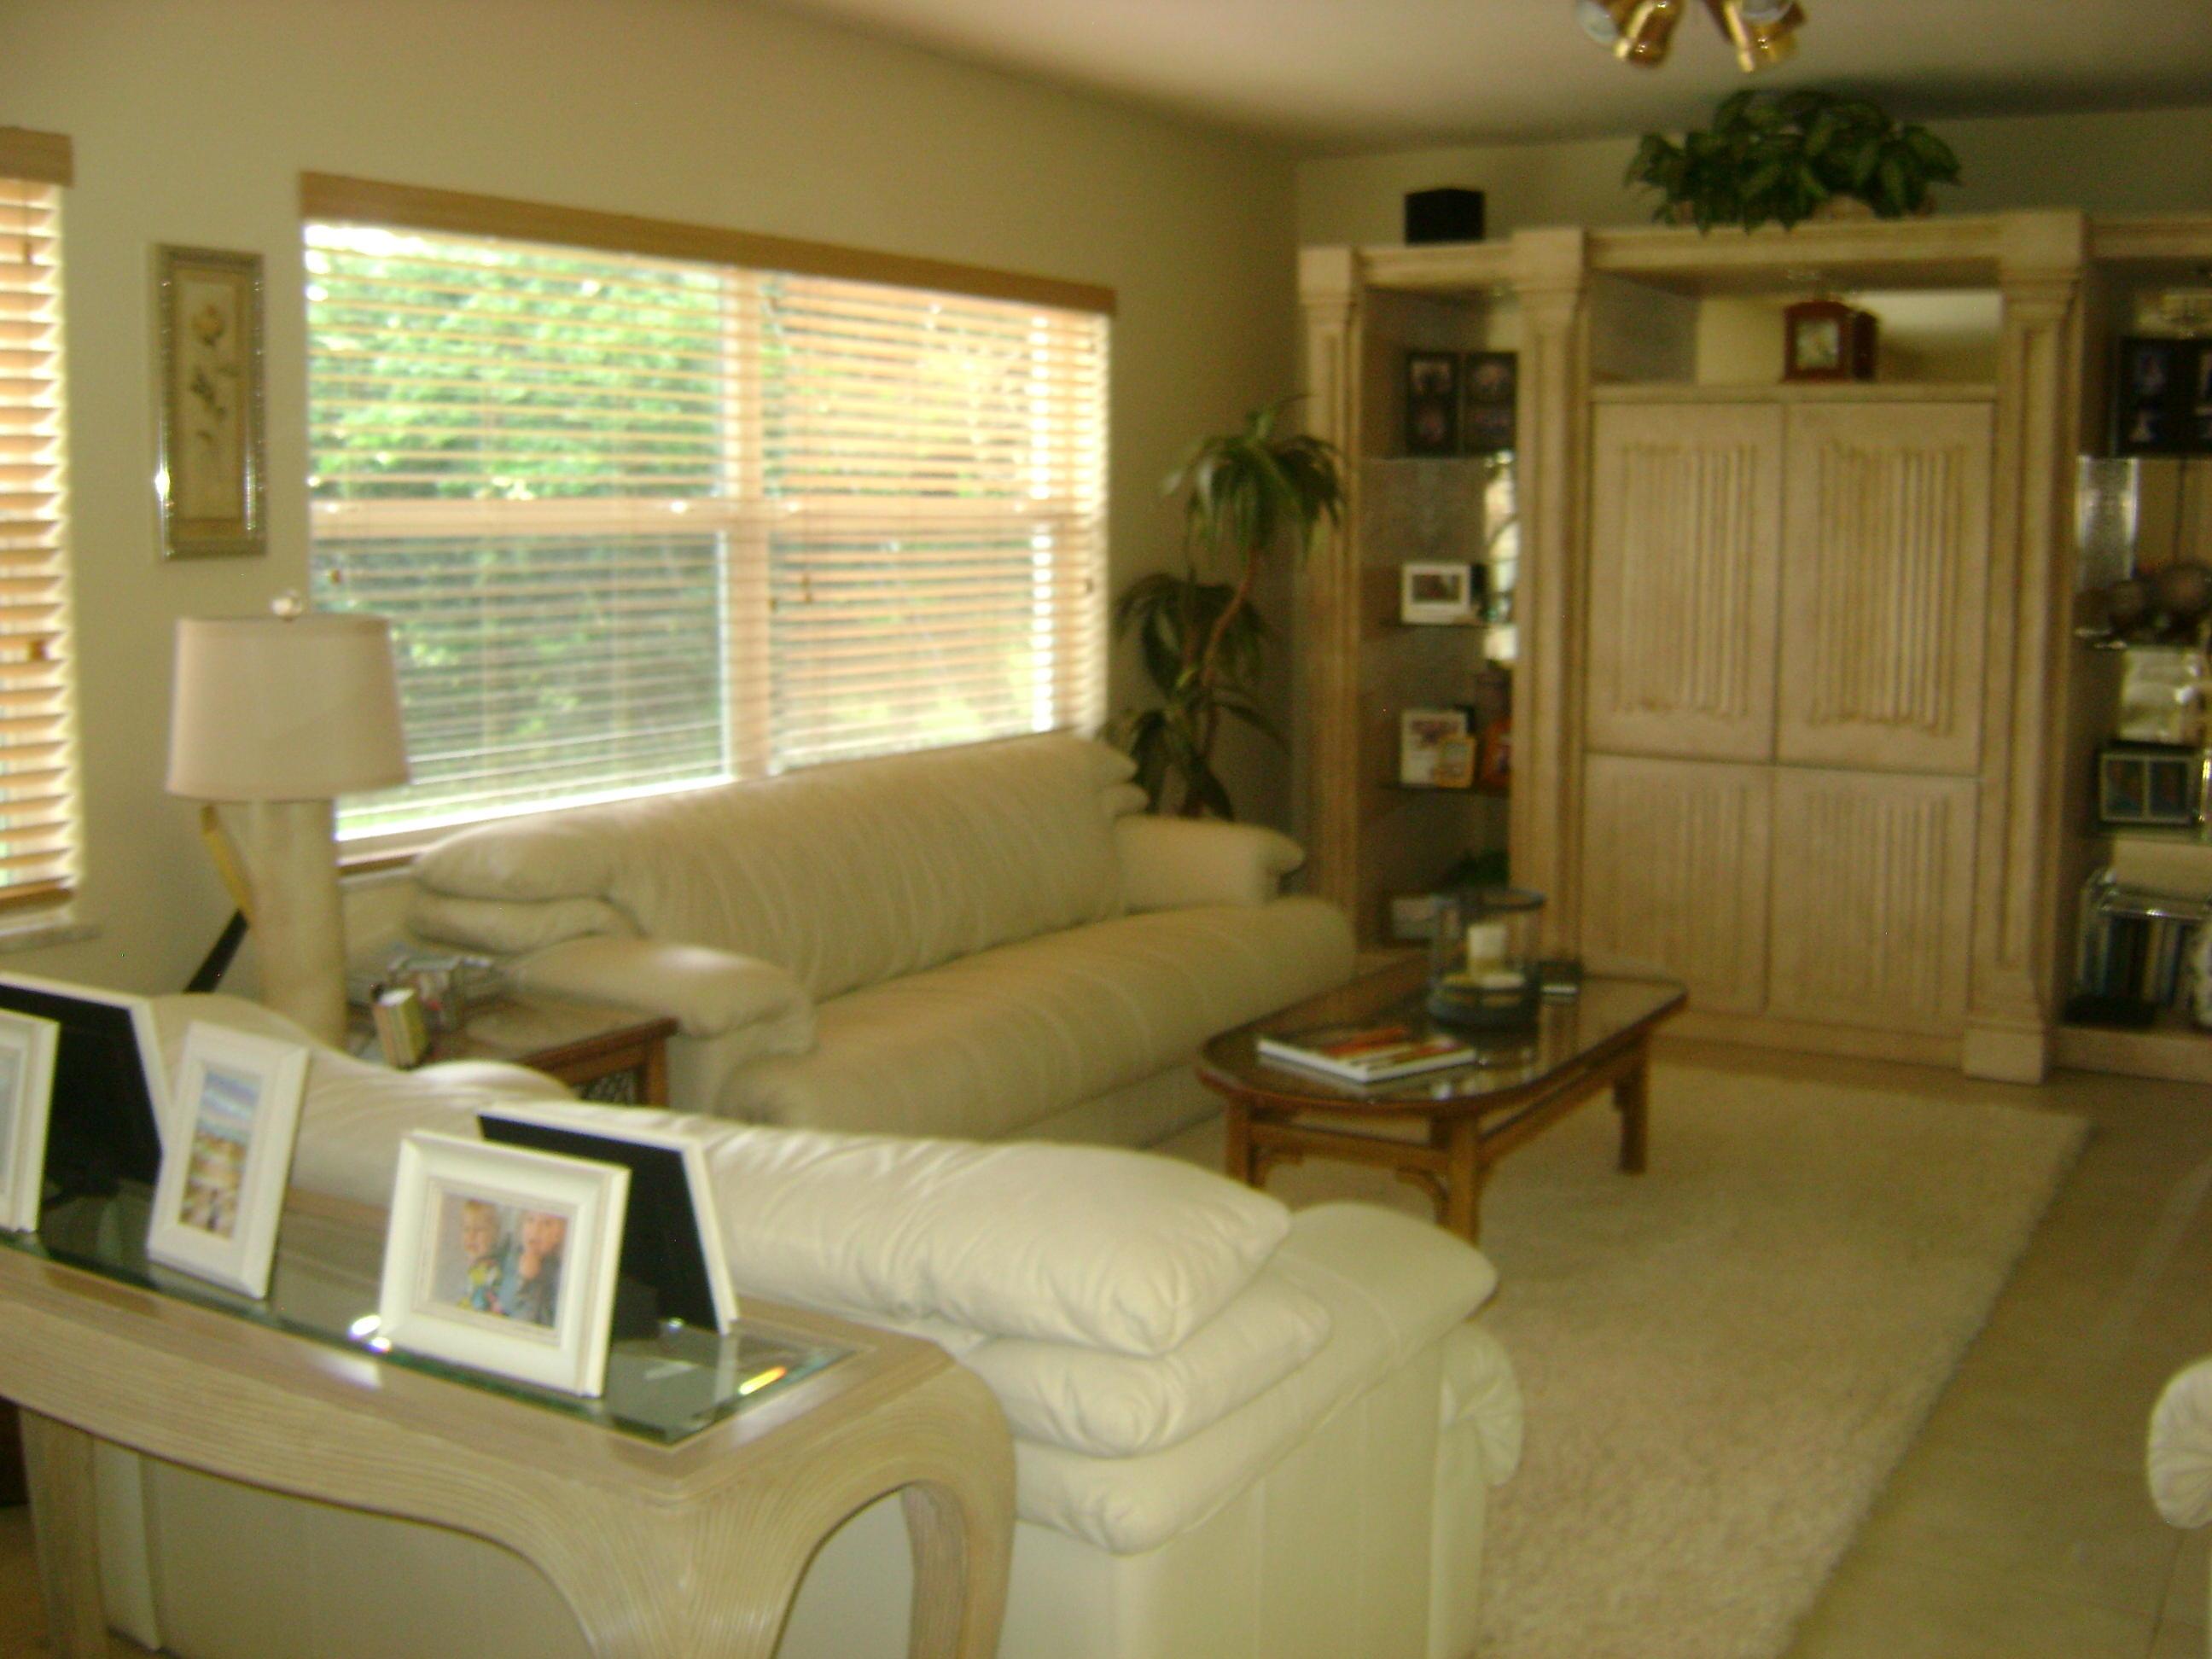 481 SW Pine Tree Lane, Palm City MLS Listing RX-10345484, Palm City ...